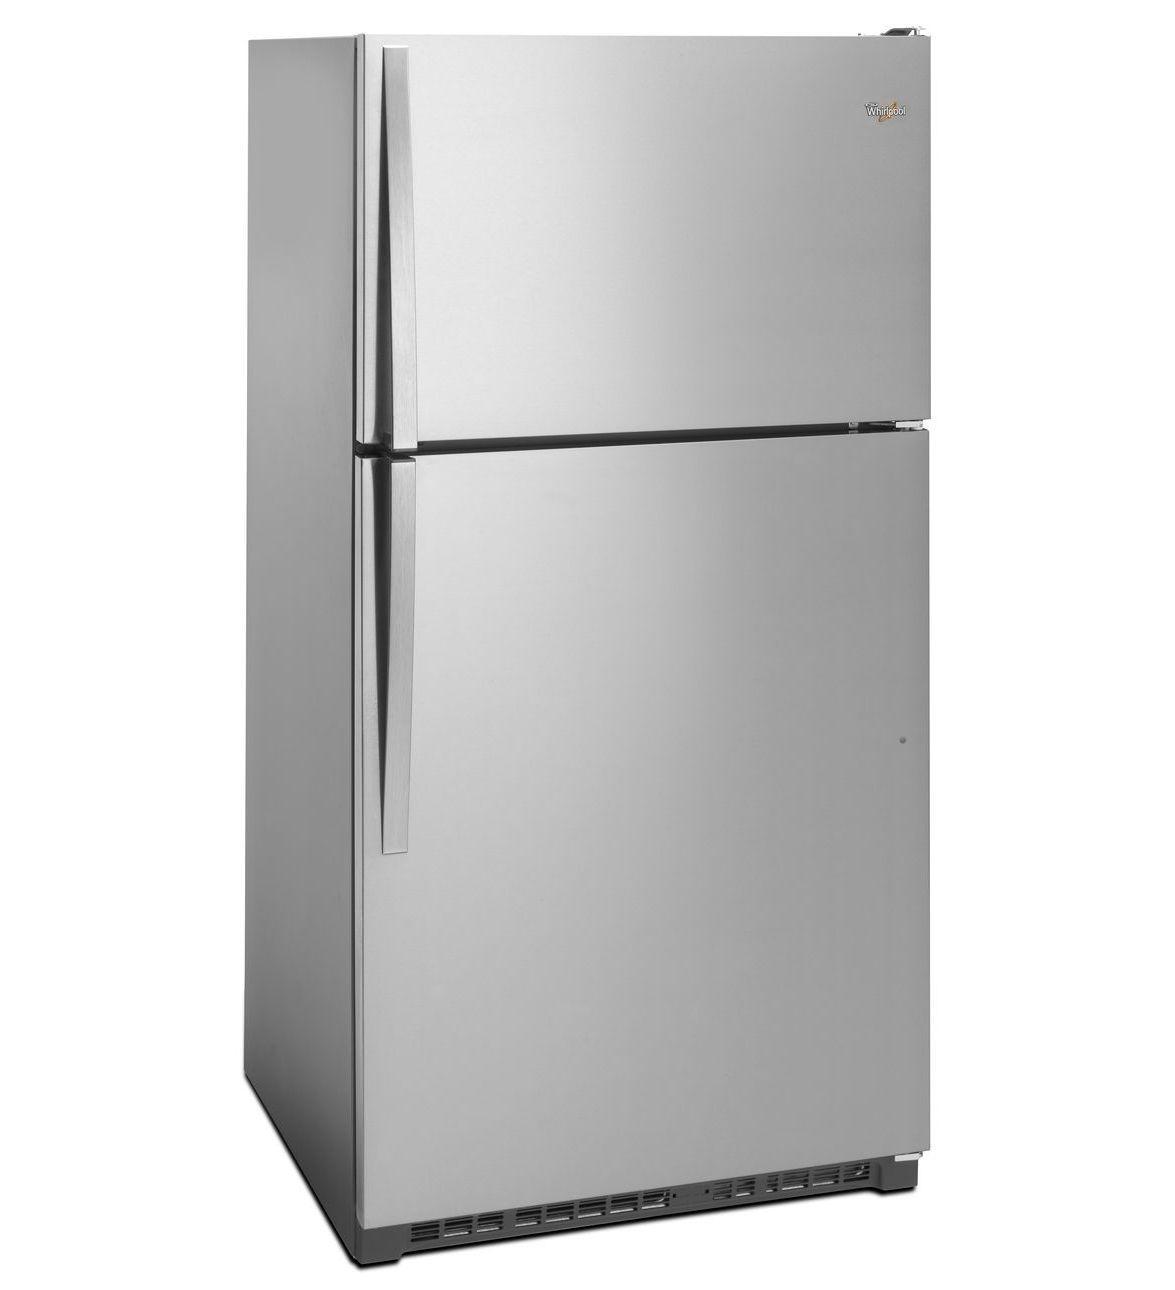 Wrt311fzd Whirlpool Wrt311fzd Top Freezer Refrigerators